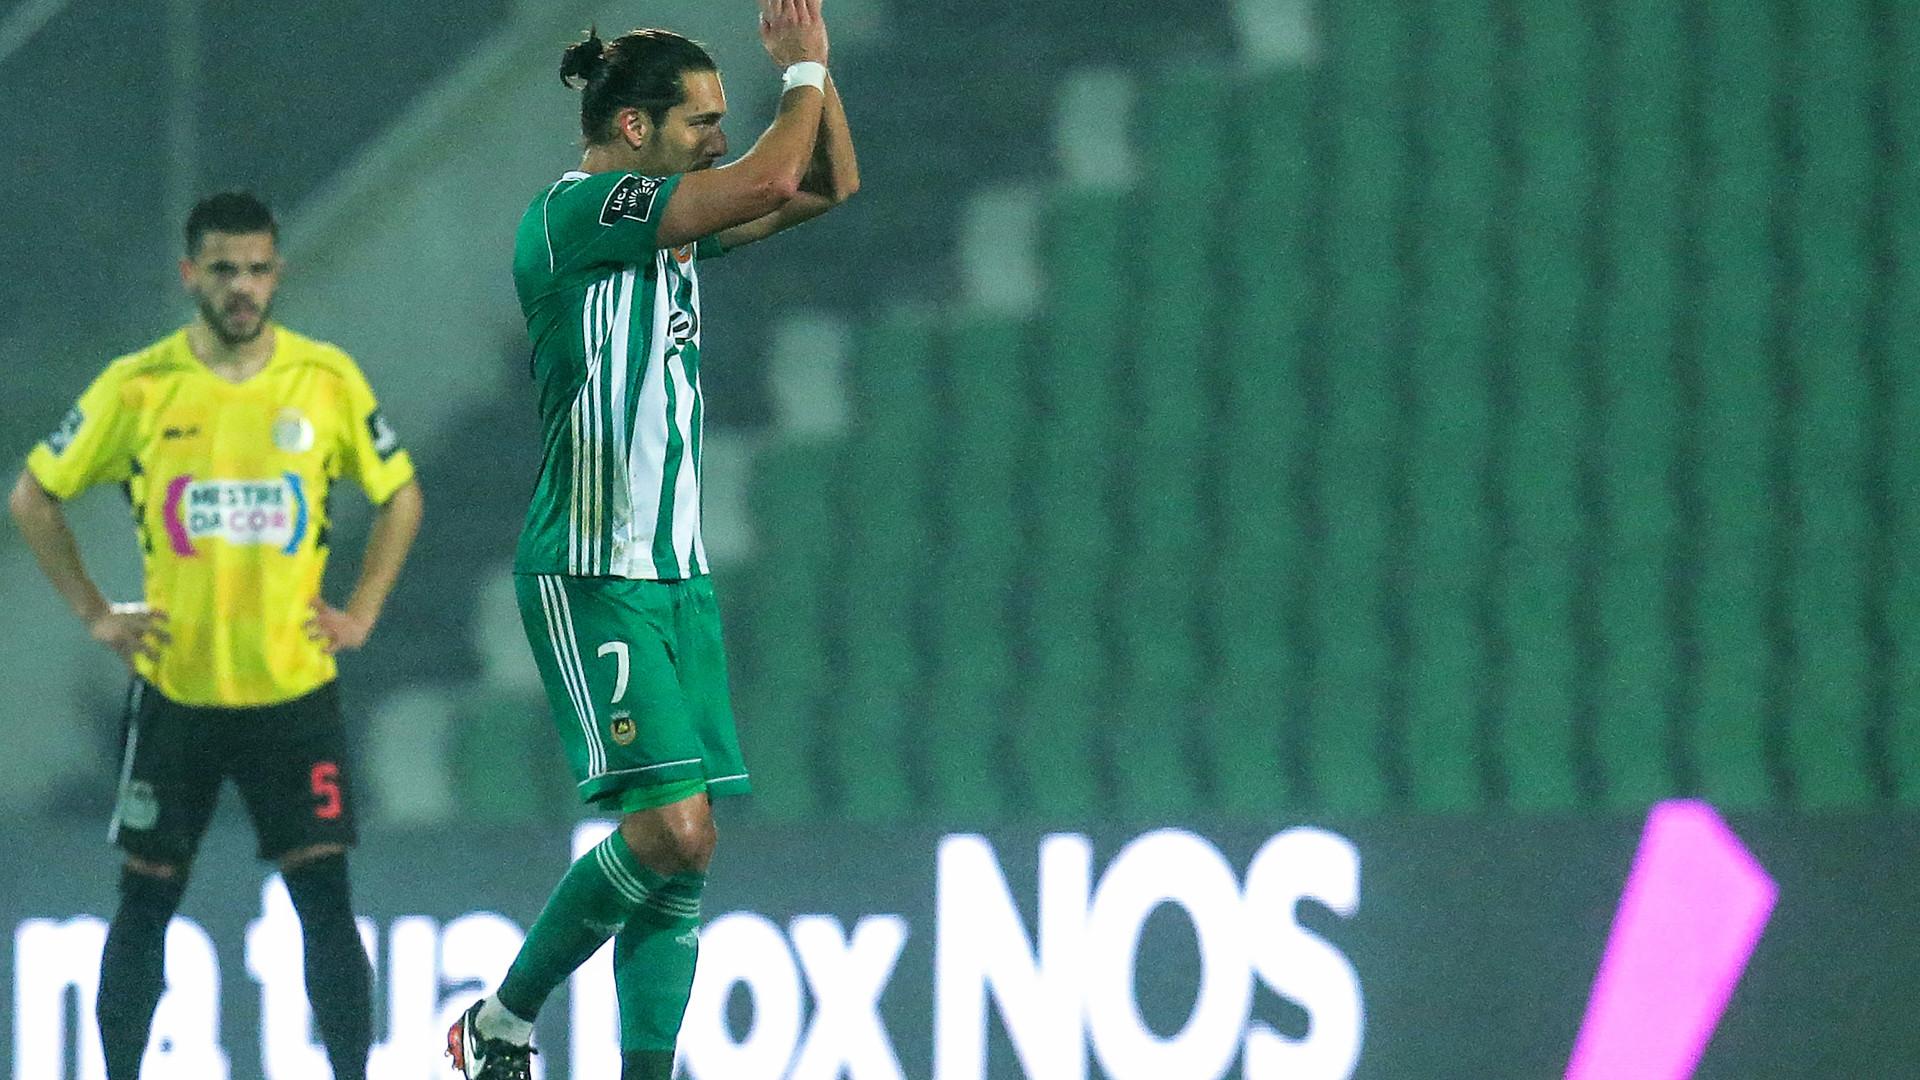 Rio Ave vence Boavista e consolida quinto lugar